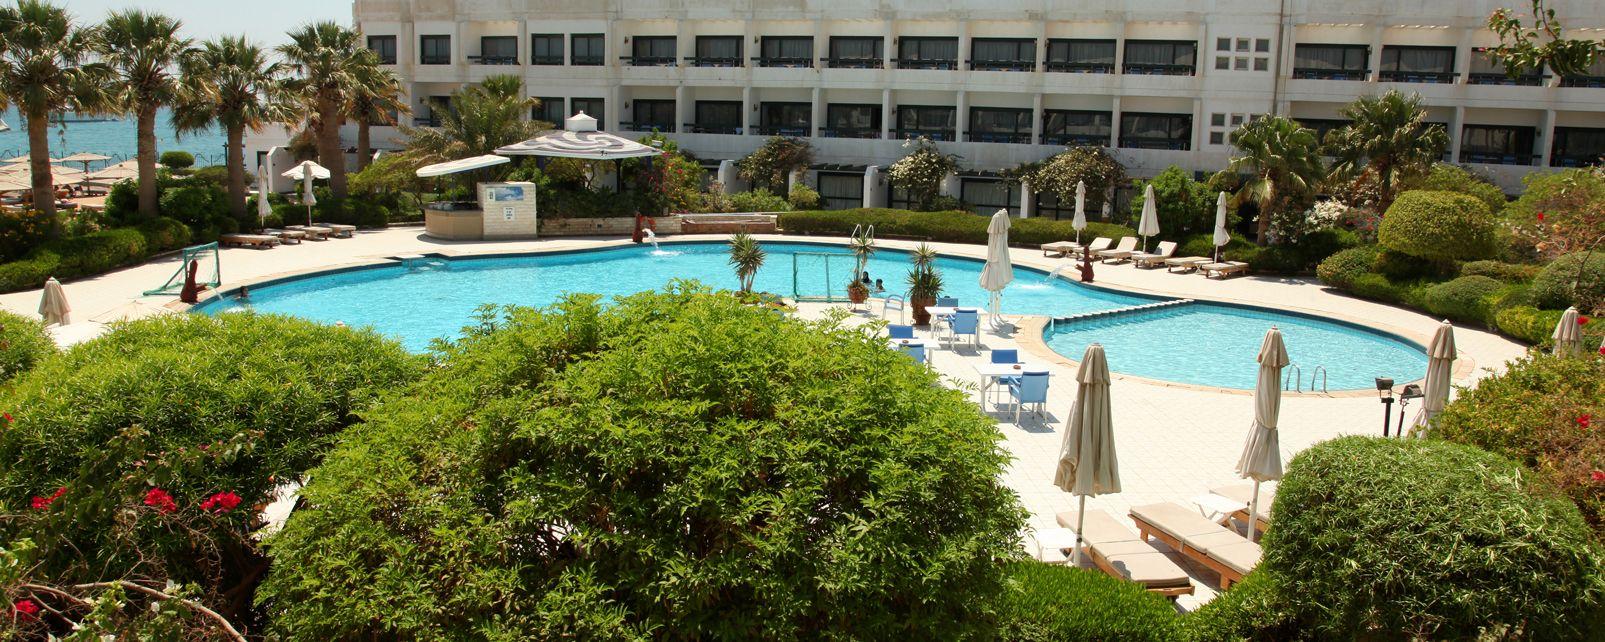 Hotel Safir Resort in Hurghada